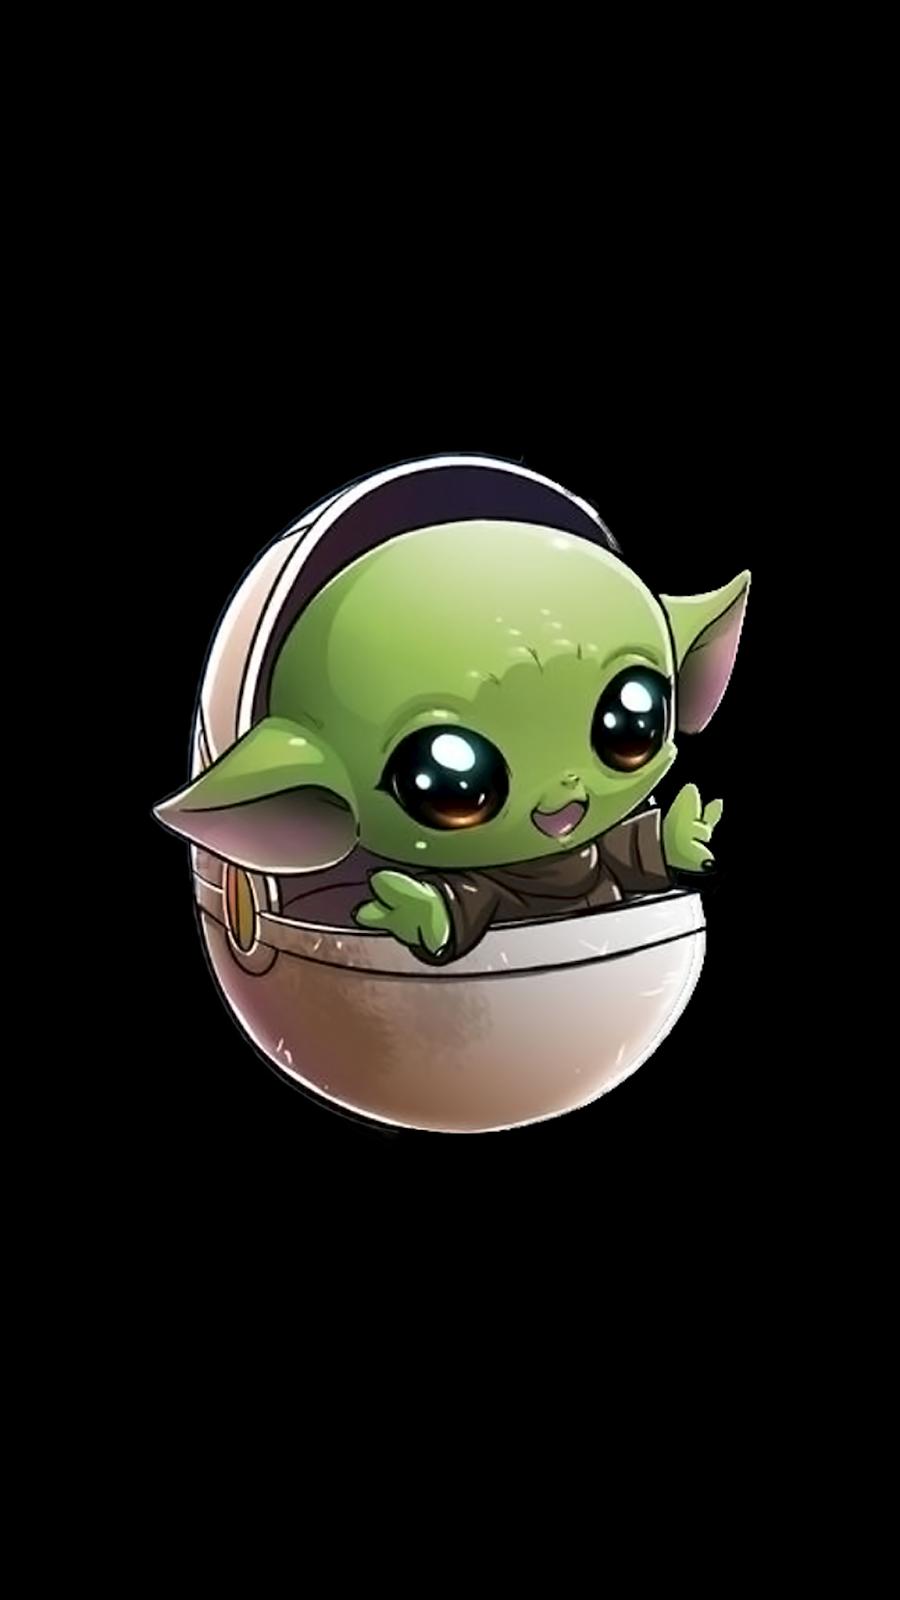 The Child Baby Yoda Phone Wallpaper Collection Cool Wallpapers Heroscreen Cc Yoda Drawing Yoda Poster Yoda Wallpaper